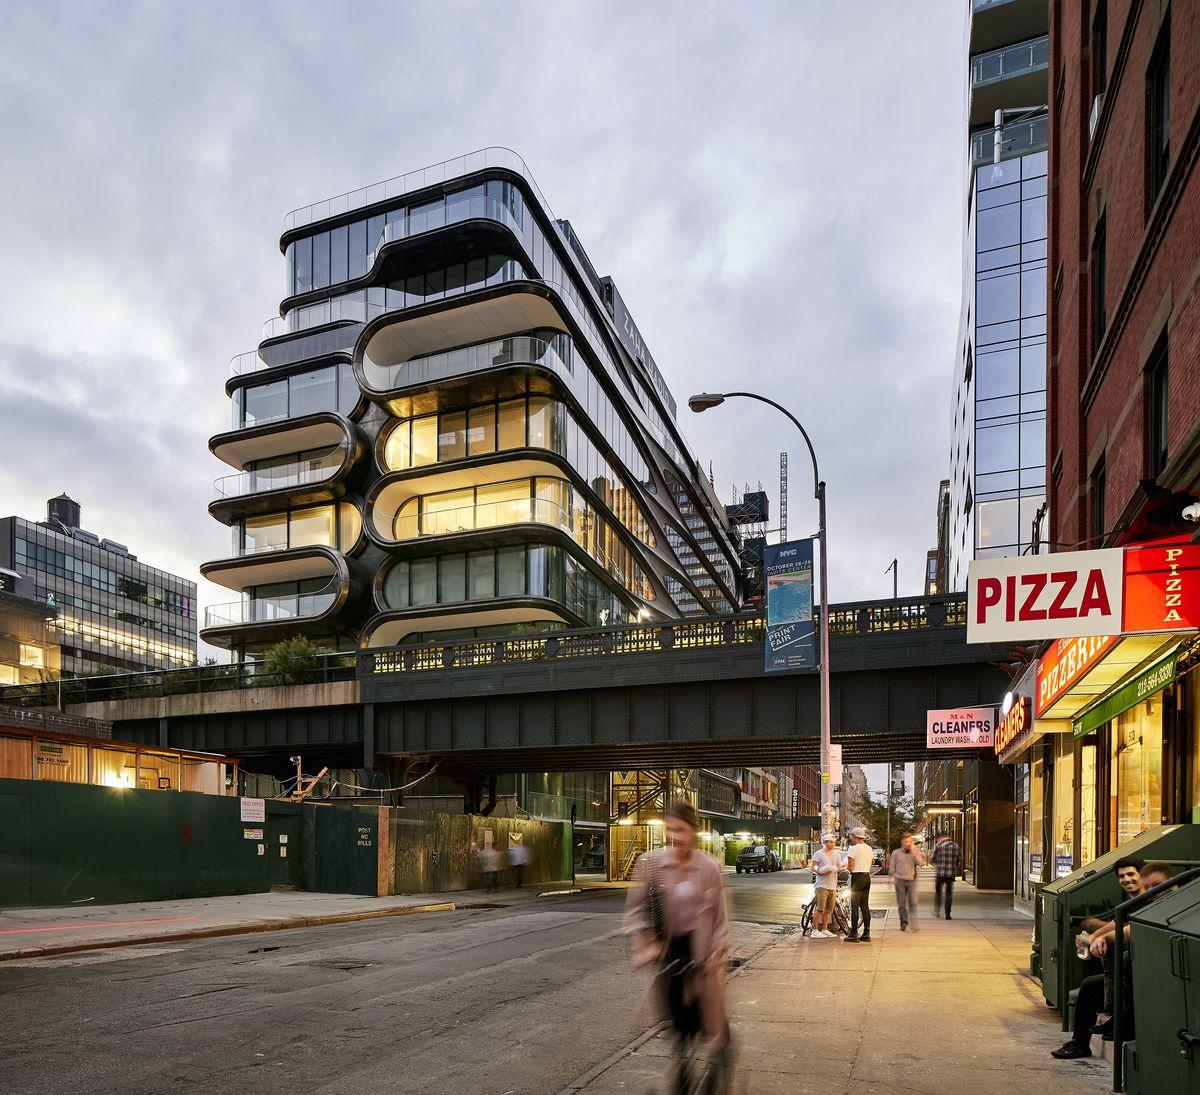 Get A Peek Inside Zaha Hadid's Futuristic High Line Condo